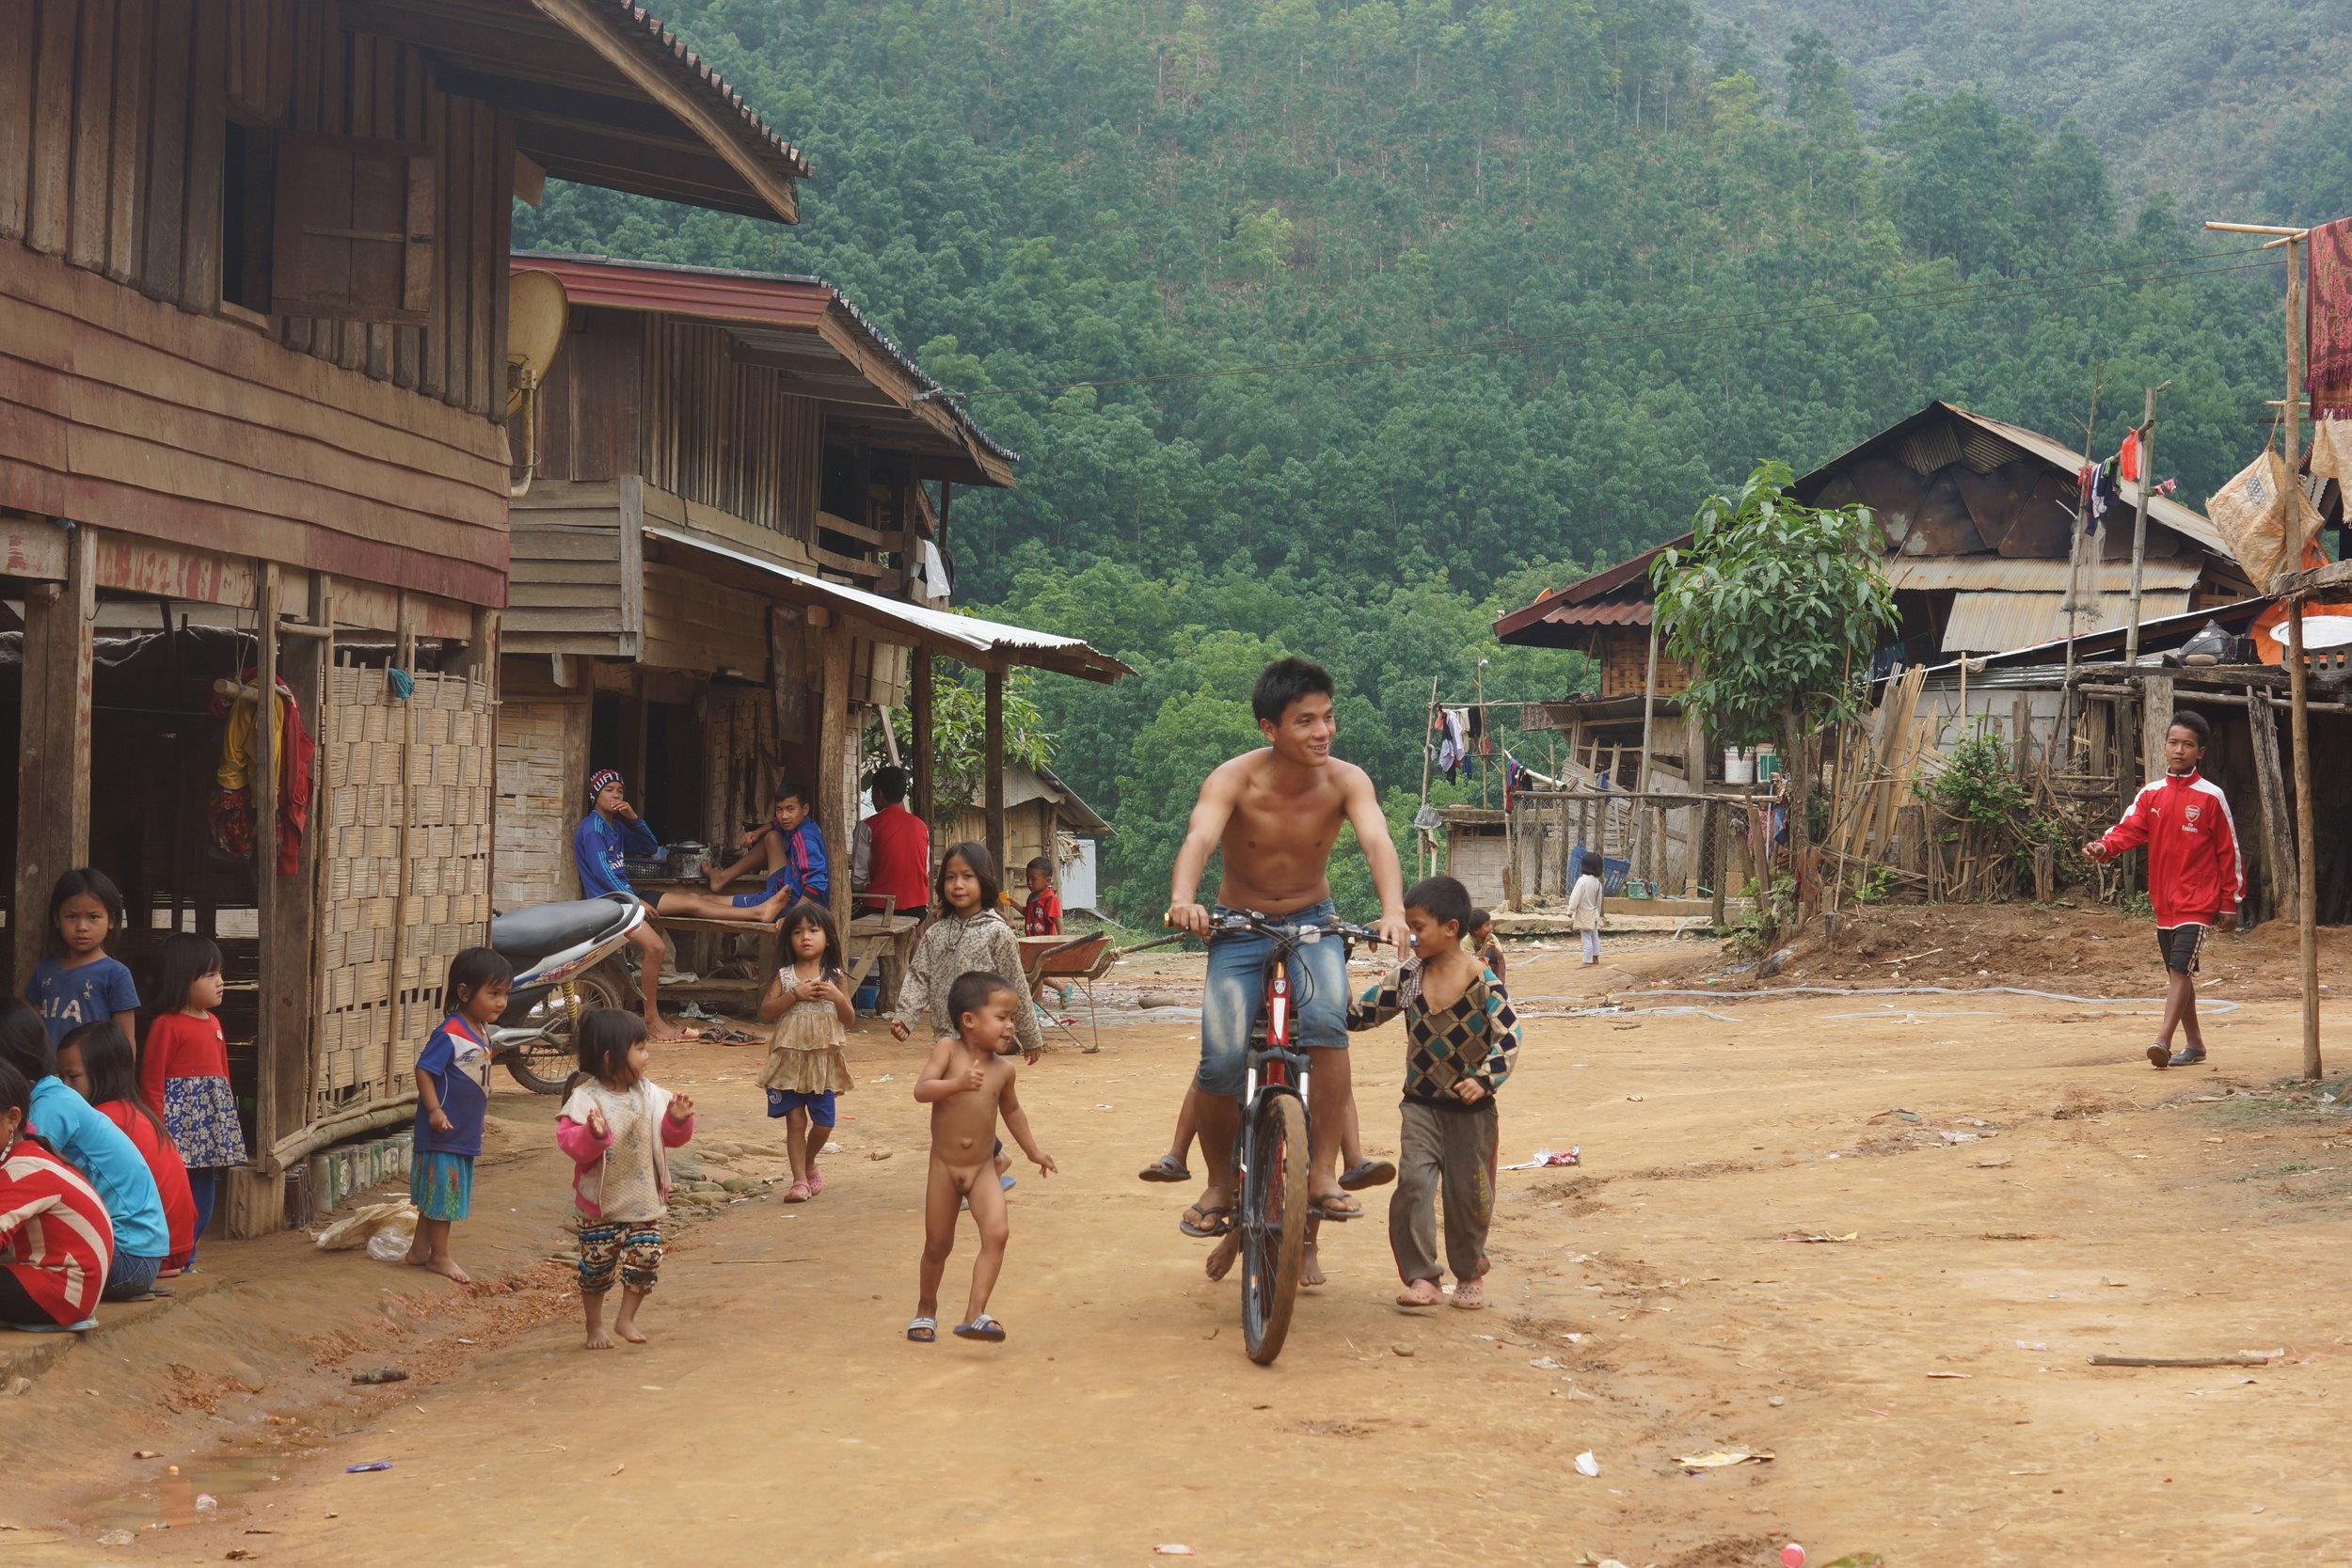 A Lakkham-Kao villager taking a joy ride on my mountain bike, village kids in pursuit.